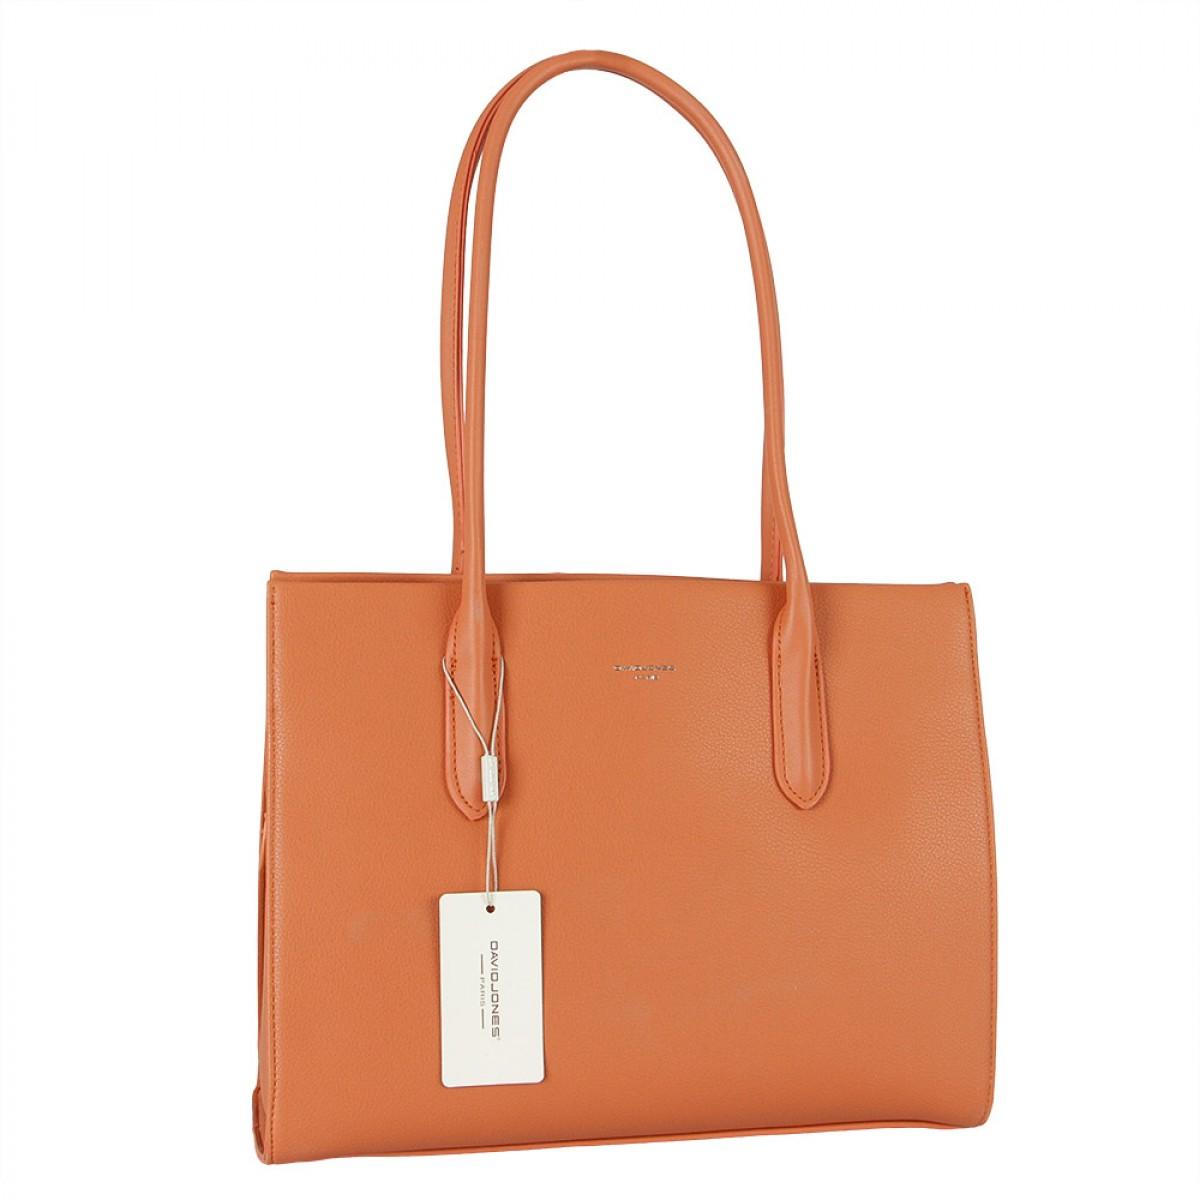 Жіноча сумка David Jones 6253-2 CORAL